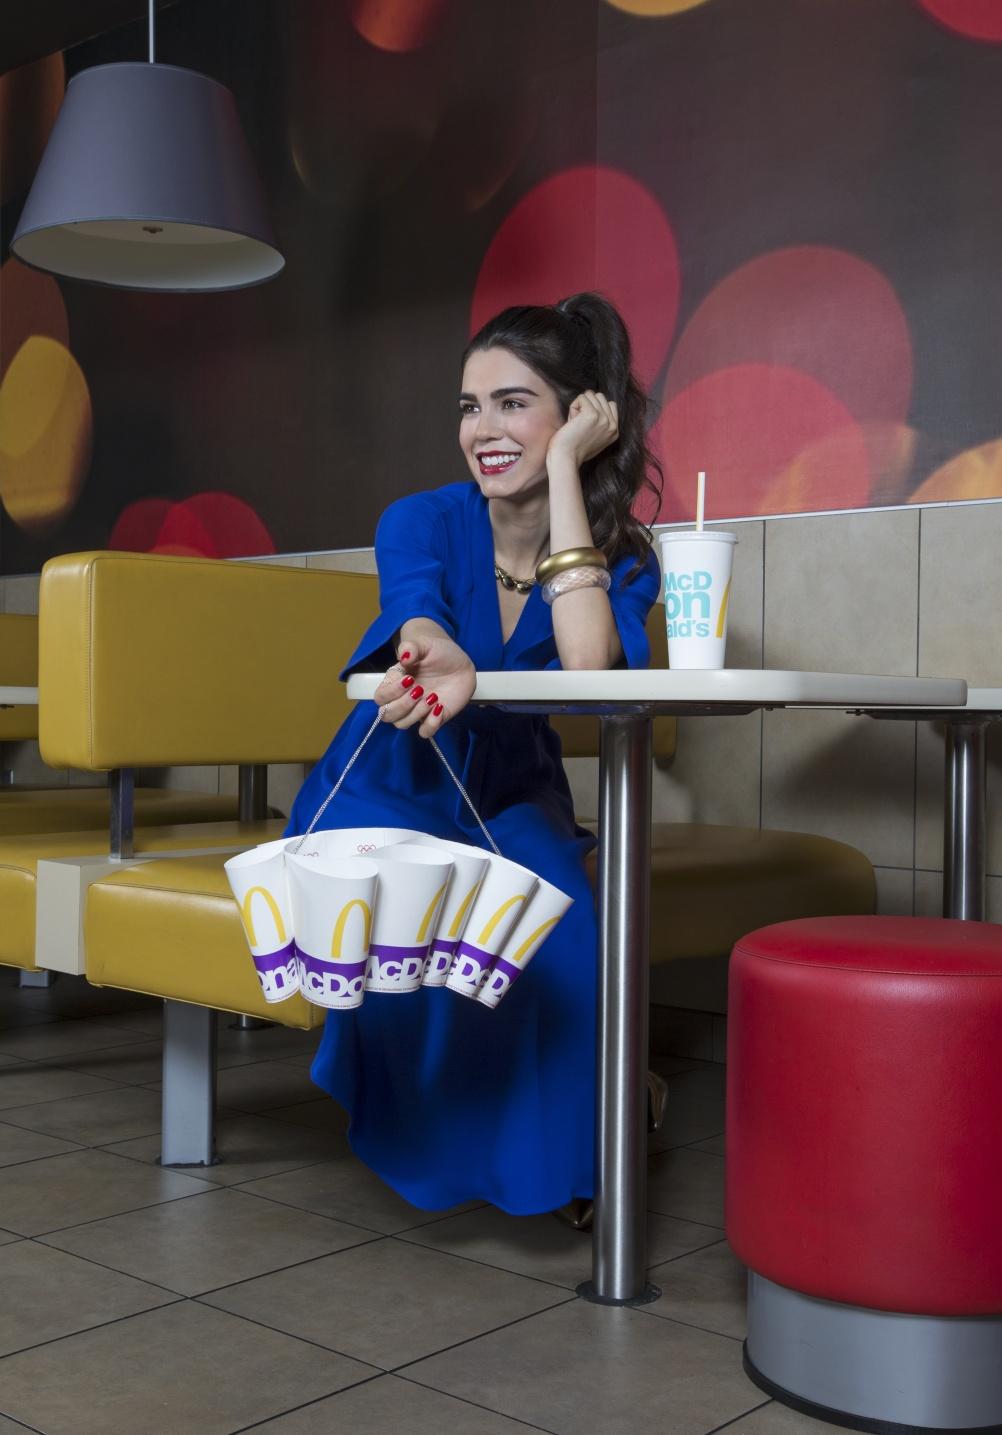 100_McDonalds-Packaging-2016-5